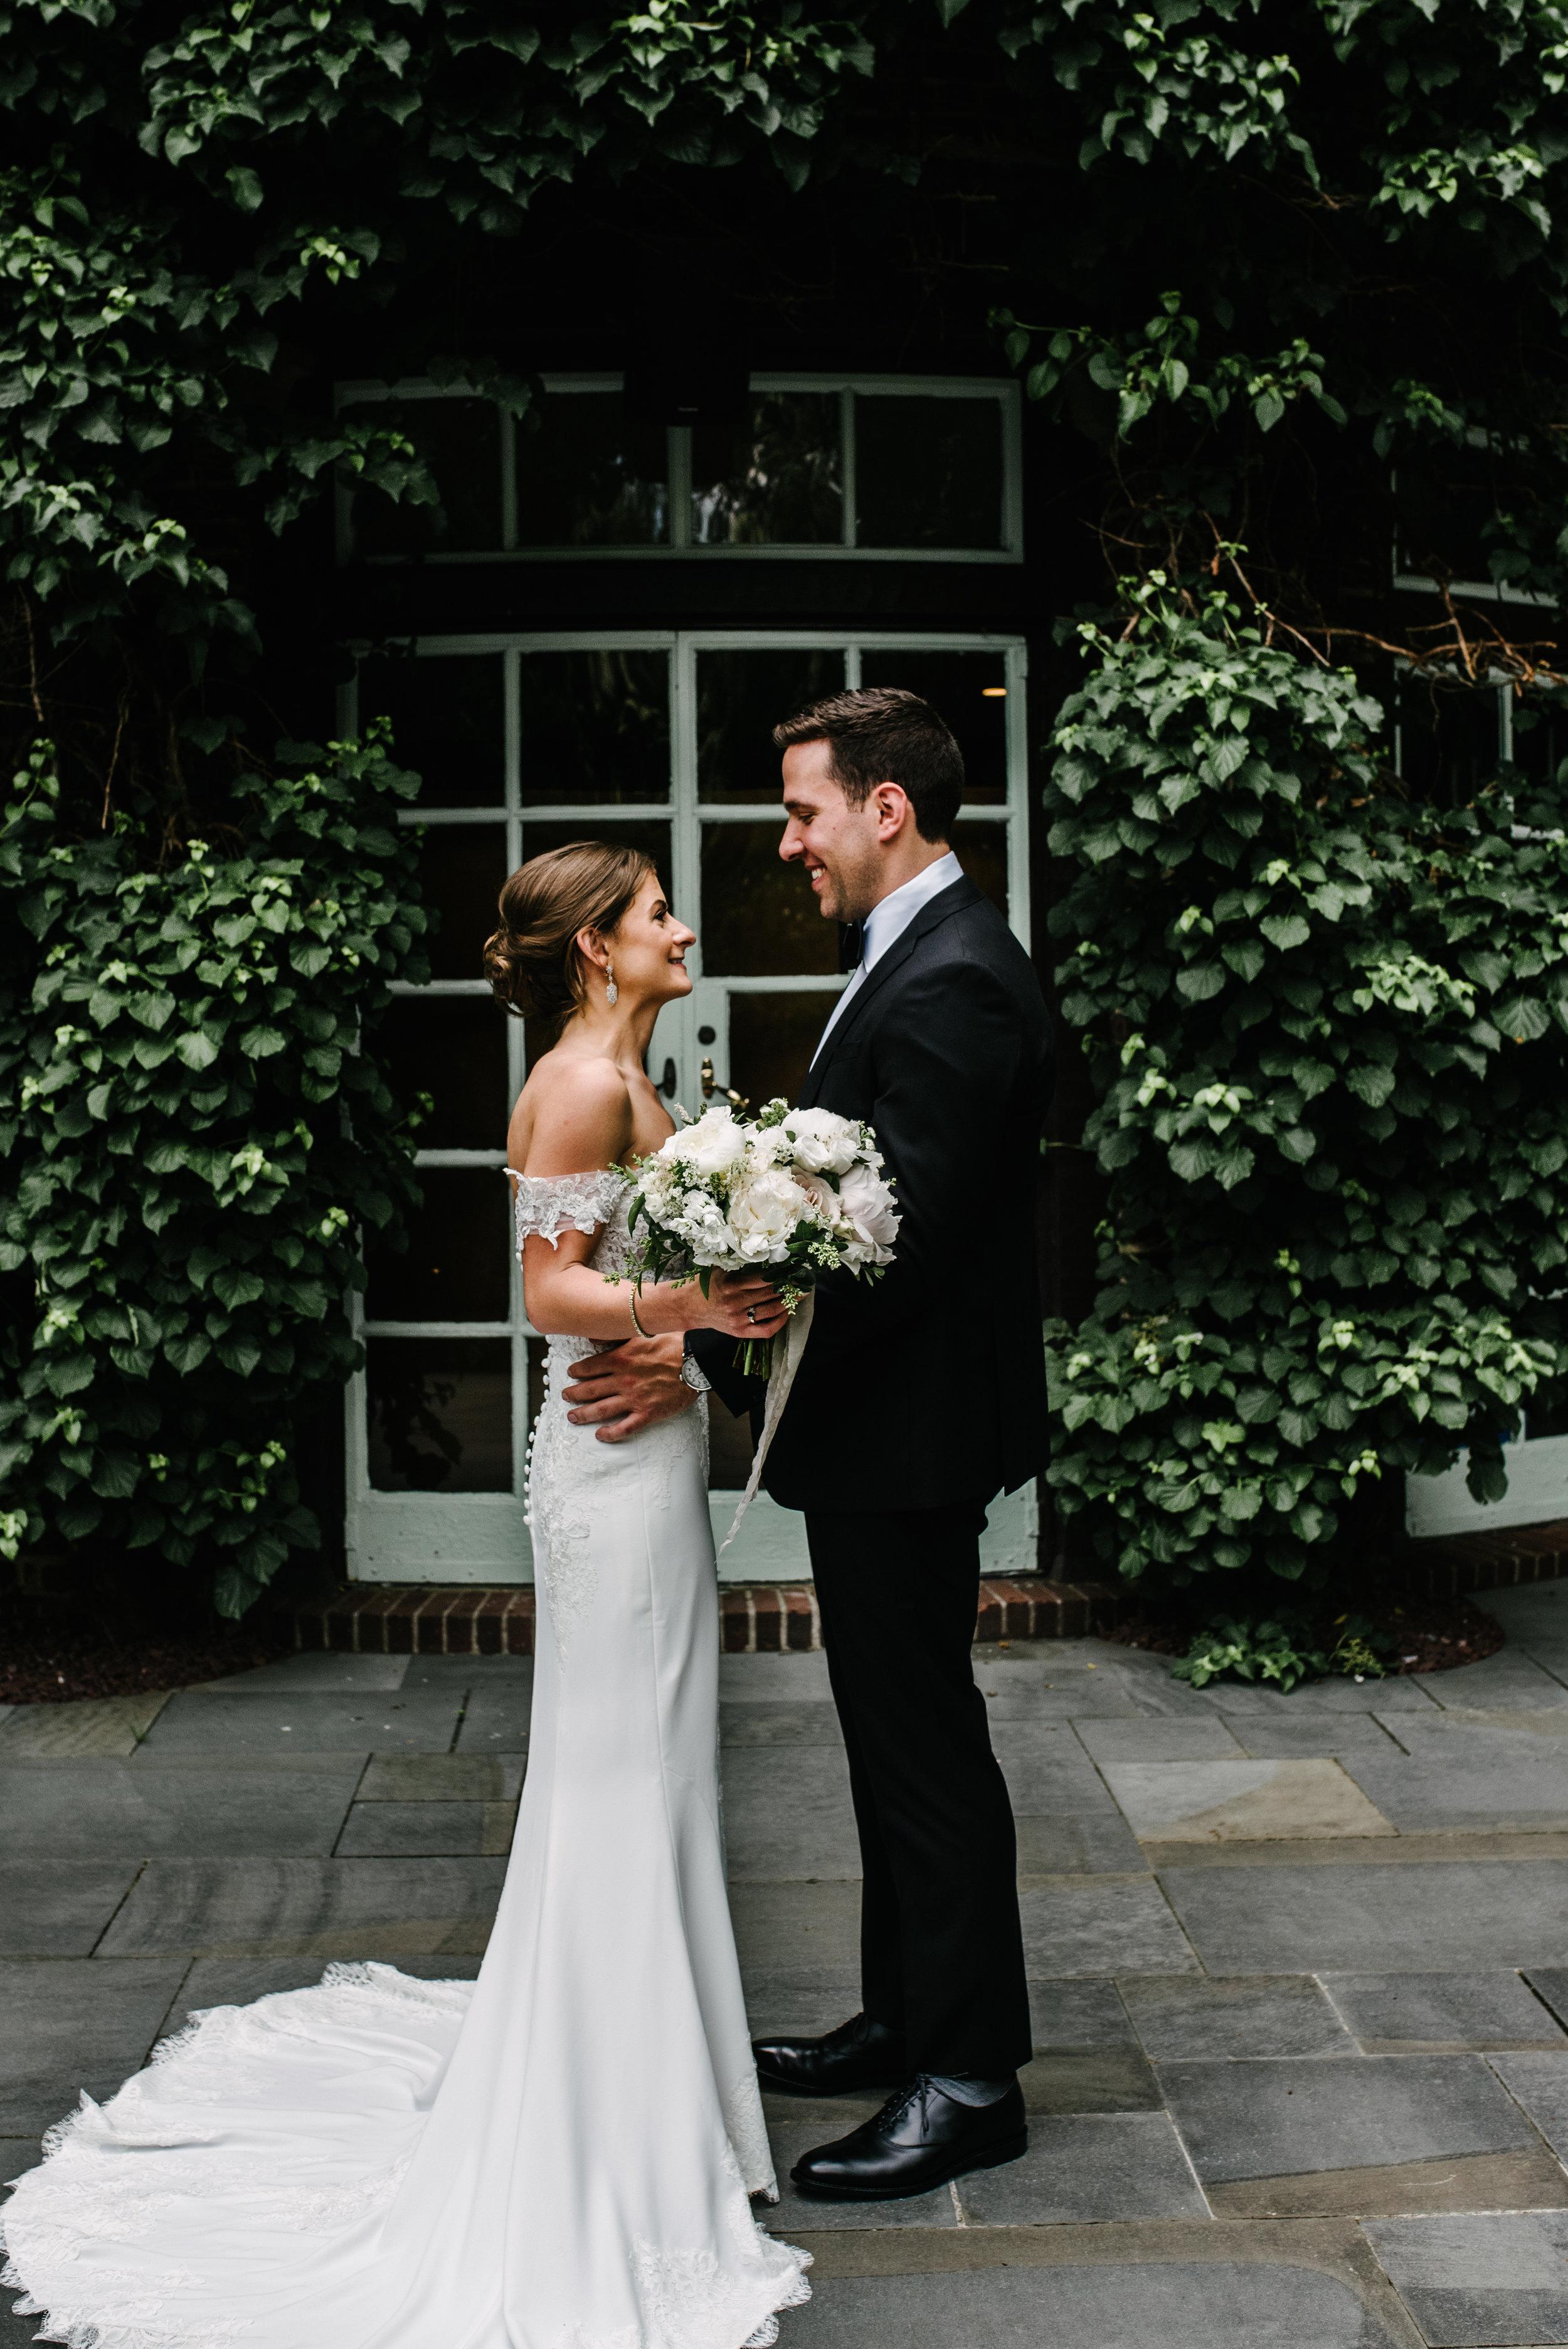 agpcollective_daniellebrett_coupleportraits-9083.jpg